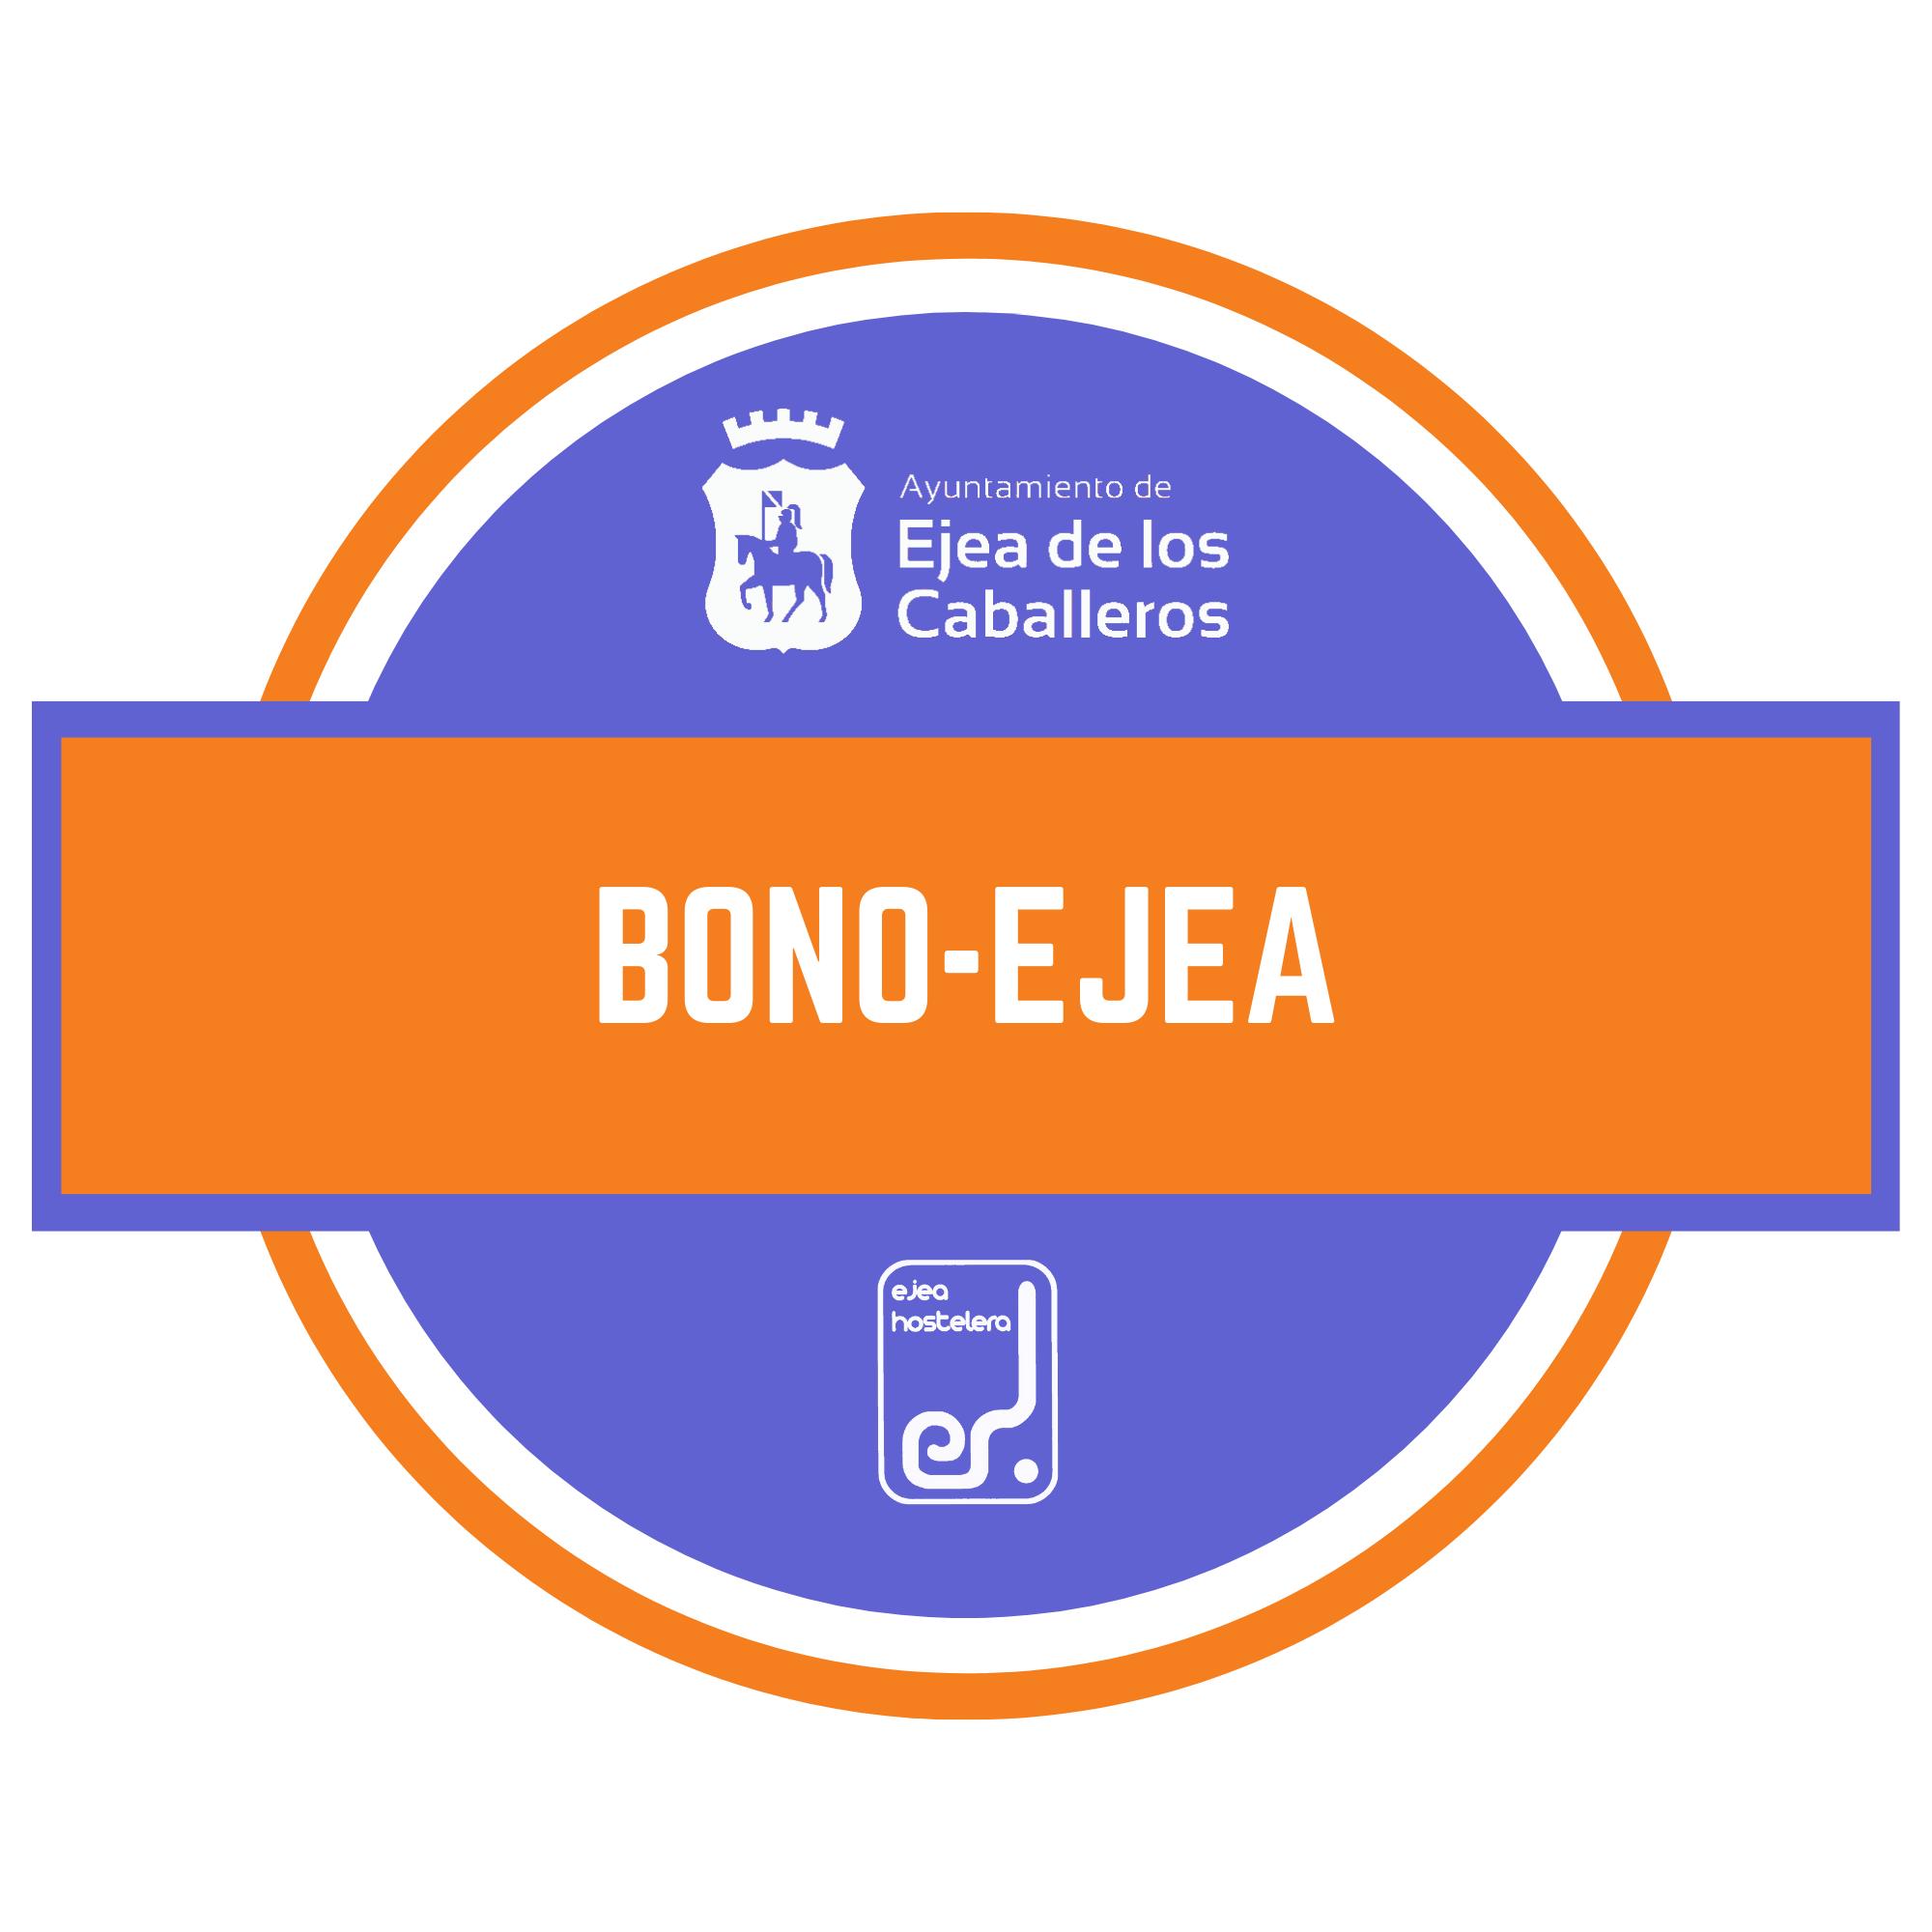 Bono Ejea